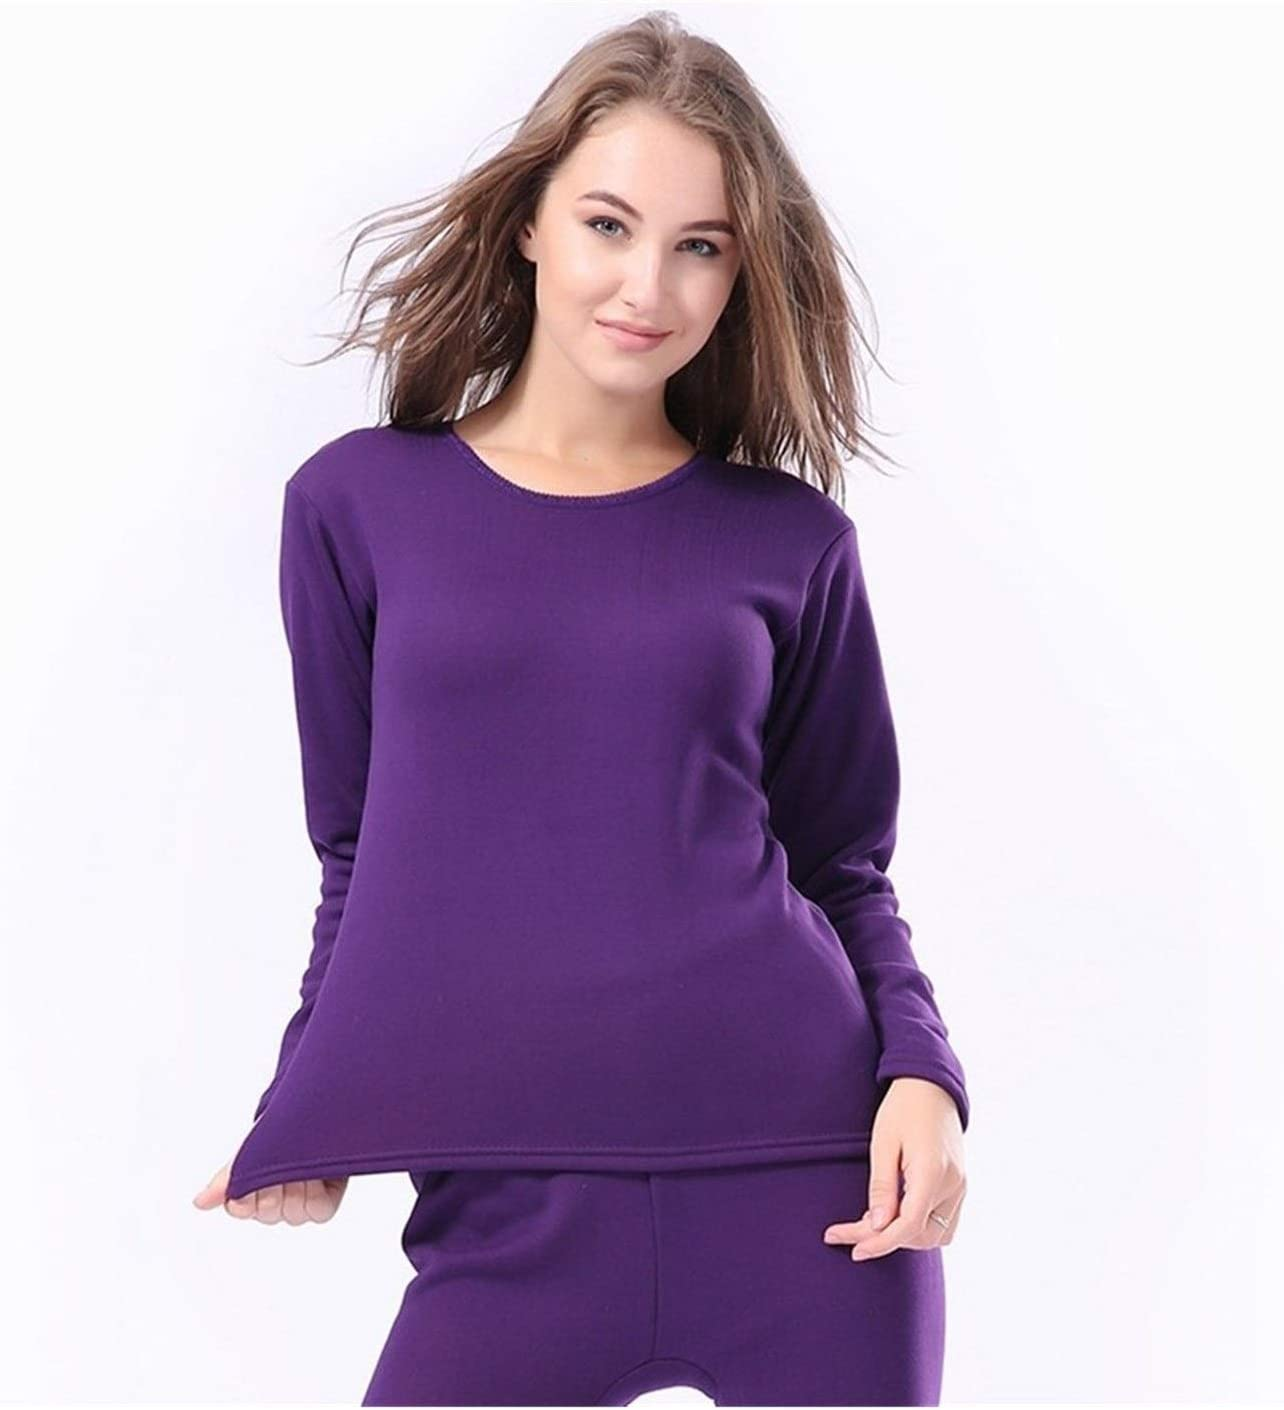 QWERBAM Women Men Thermal Underwear Autumn Winter Thicken Lovers Pajama Keep Warm Clothes Cotton Set (Color : Women 3, Size : L.)